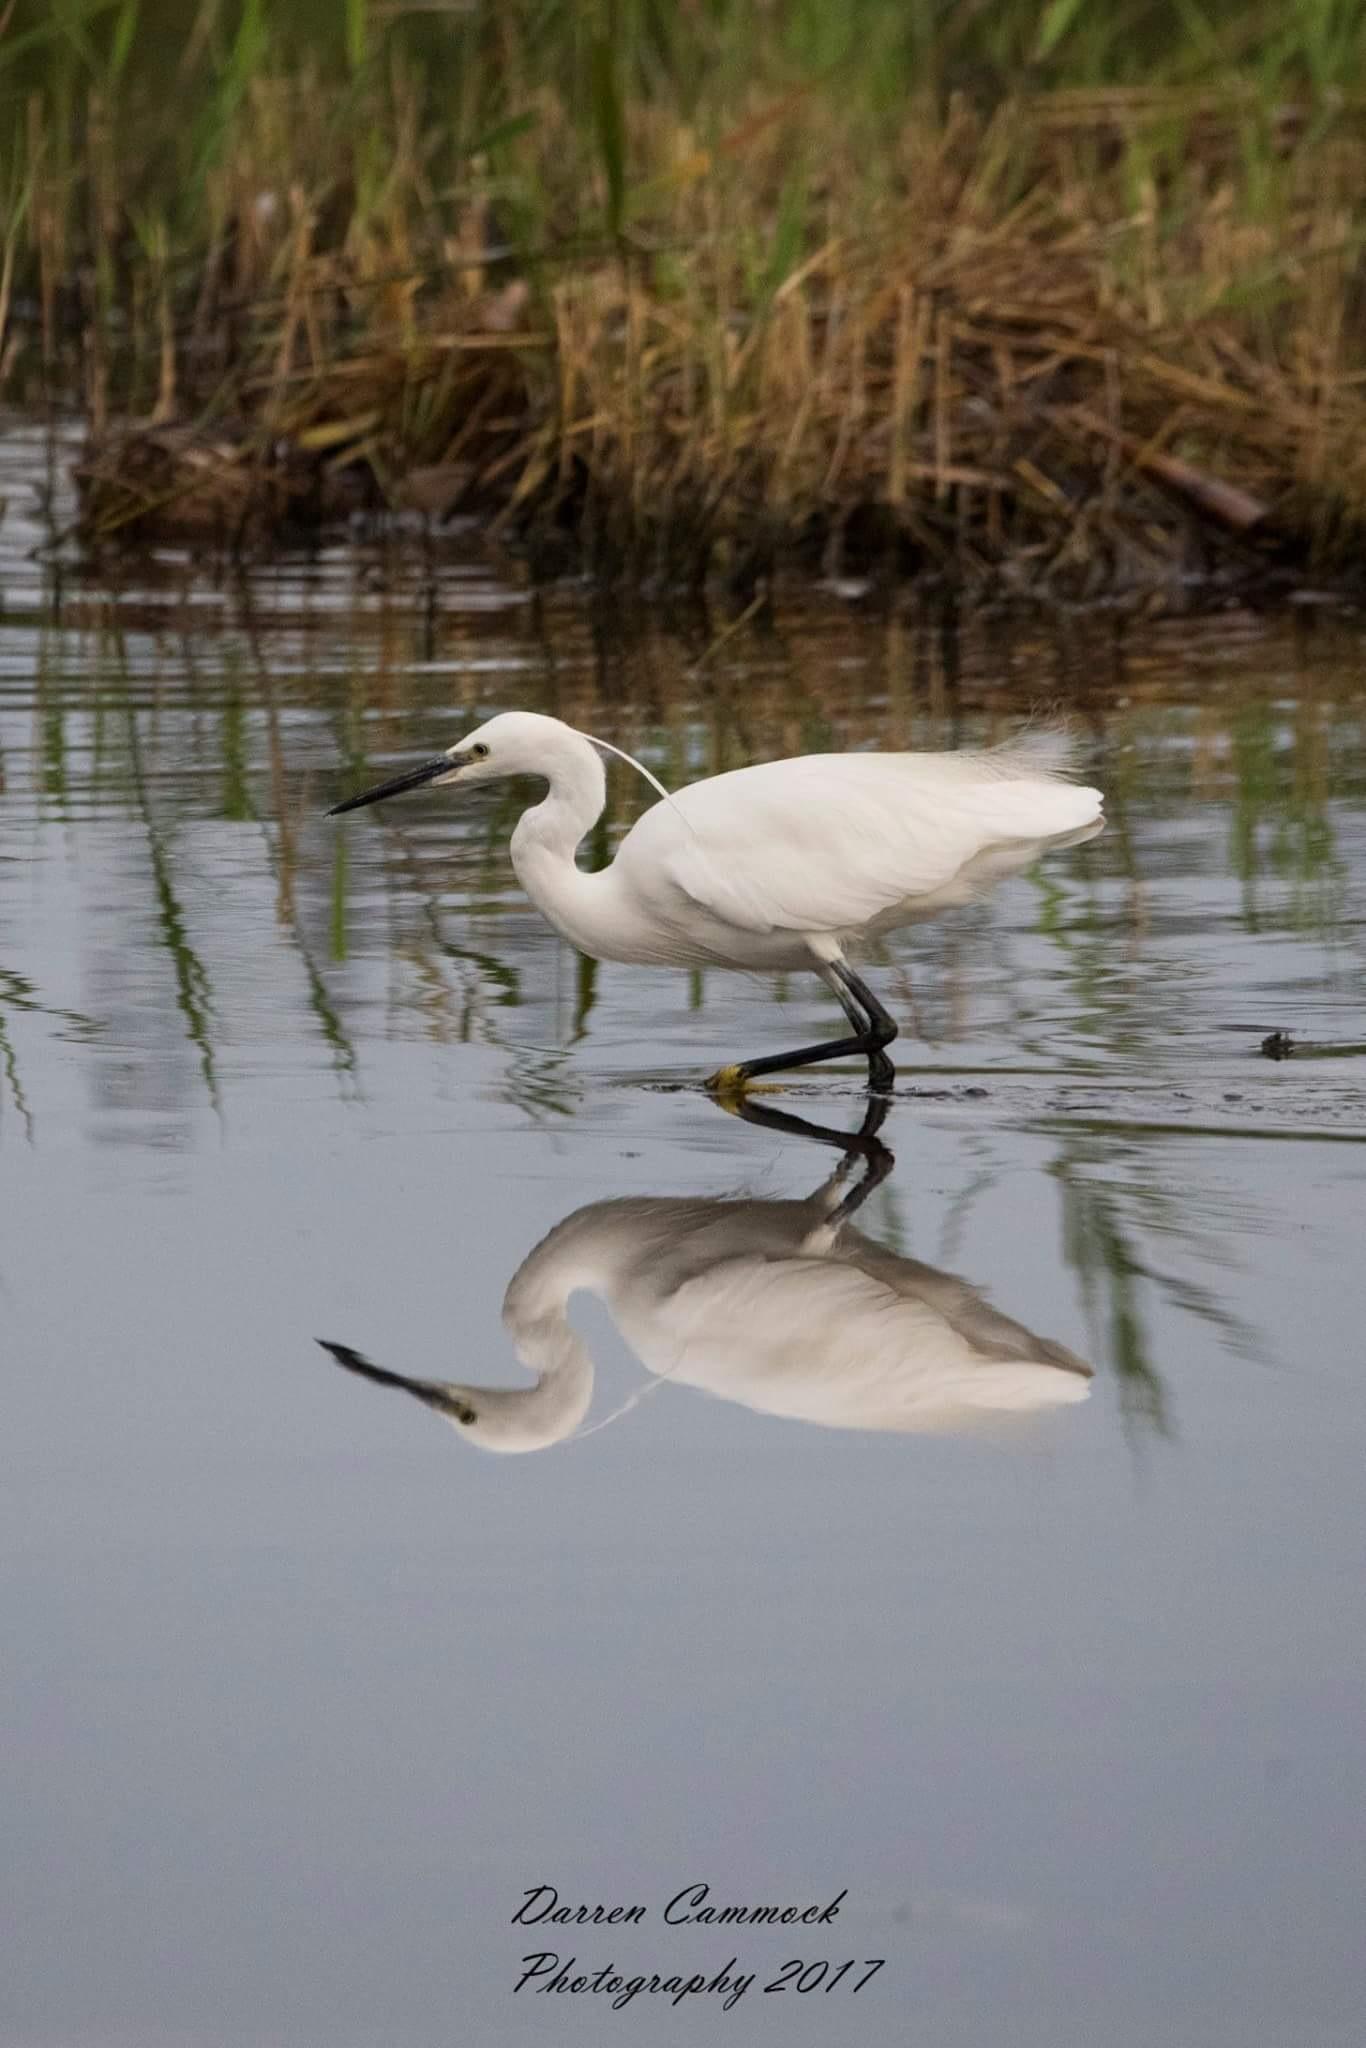 Egret by darrencammock